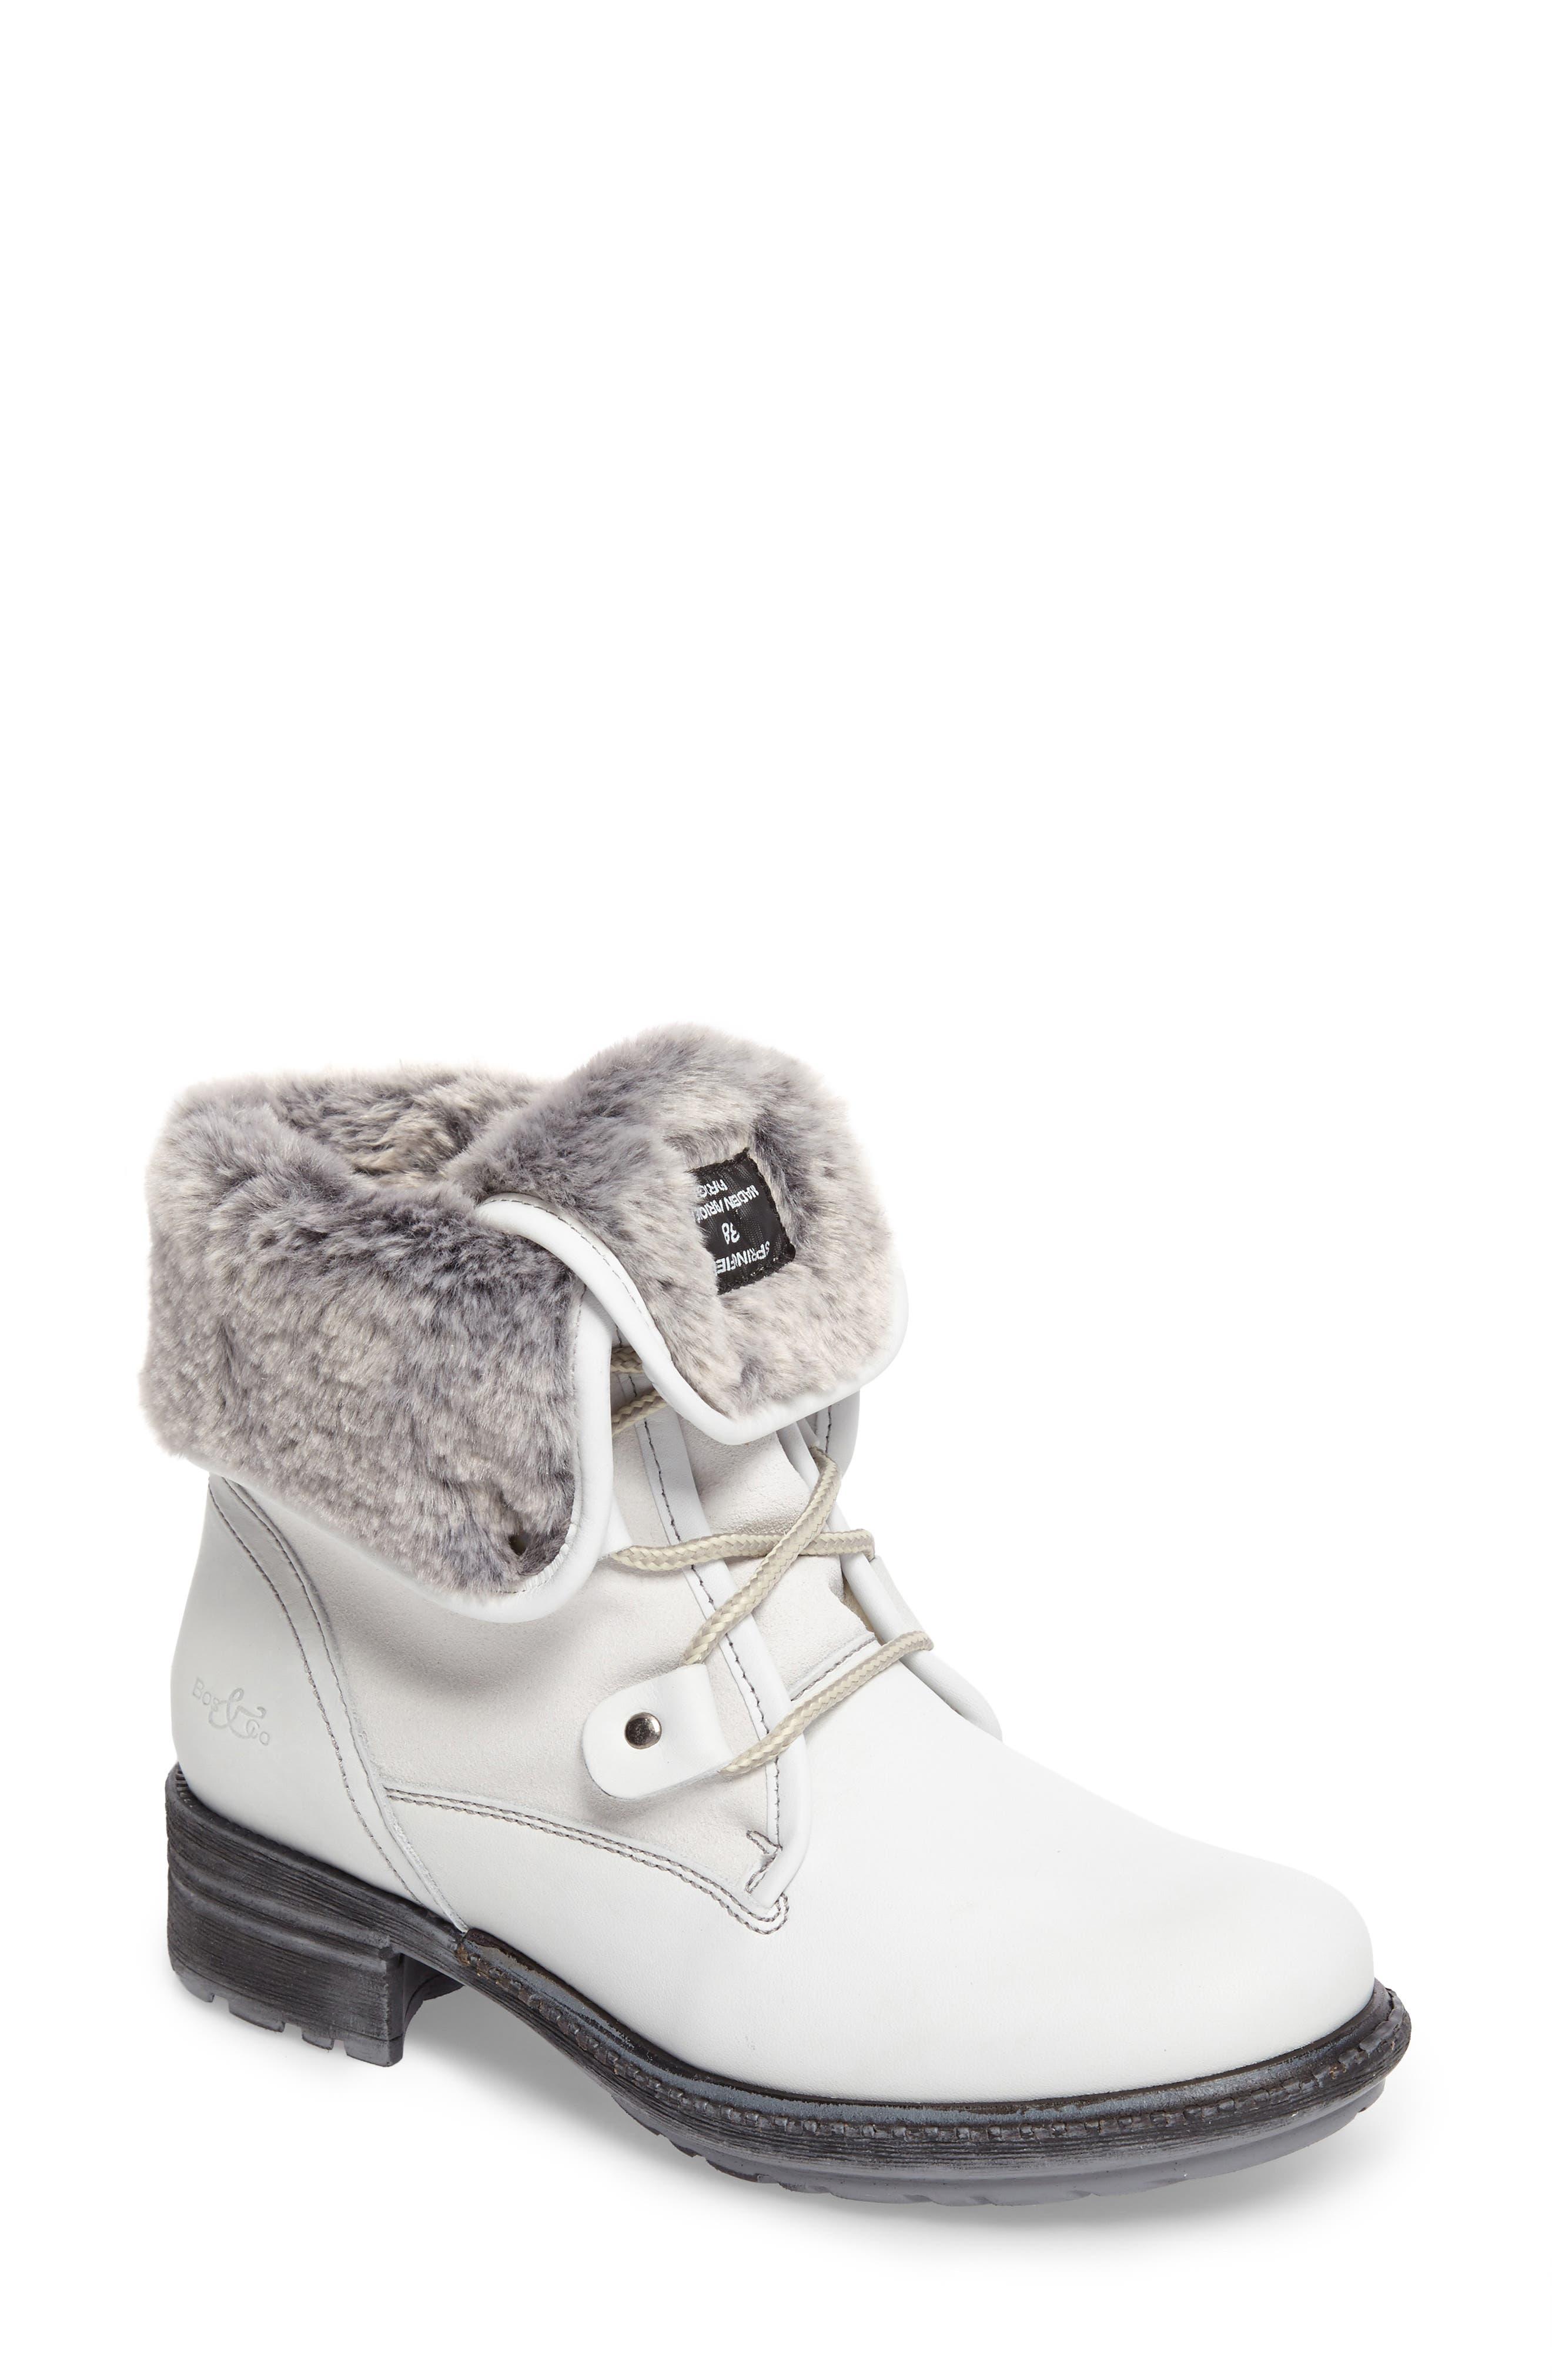 Springfield Waterproof Winter Boot,                             Main thumbnail 1, color,                             White/ Grey/ Black